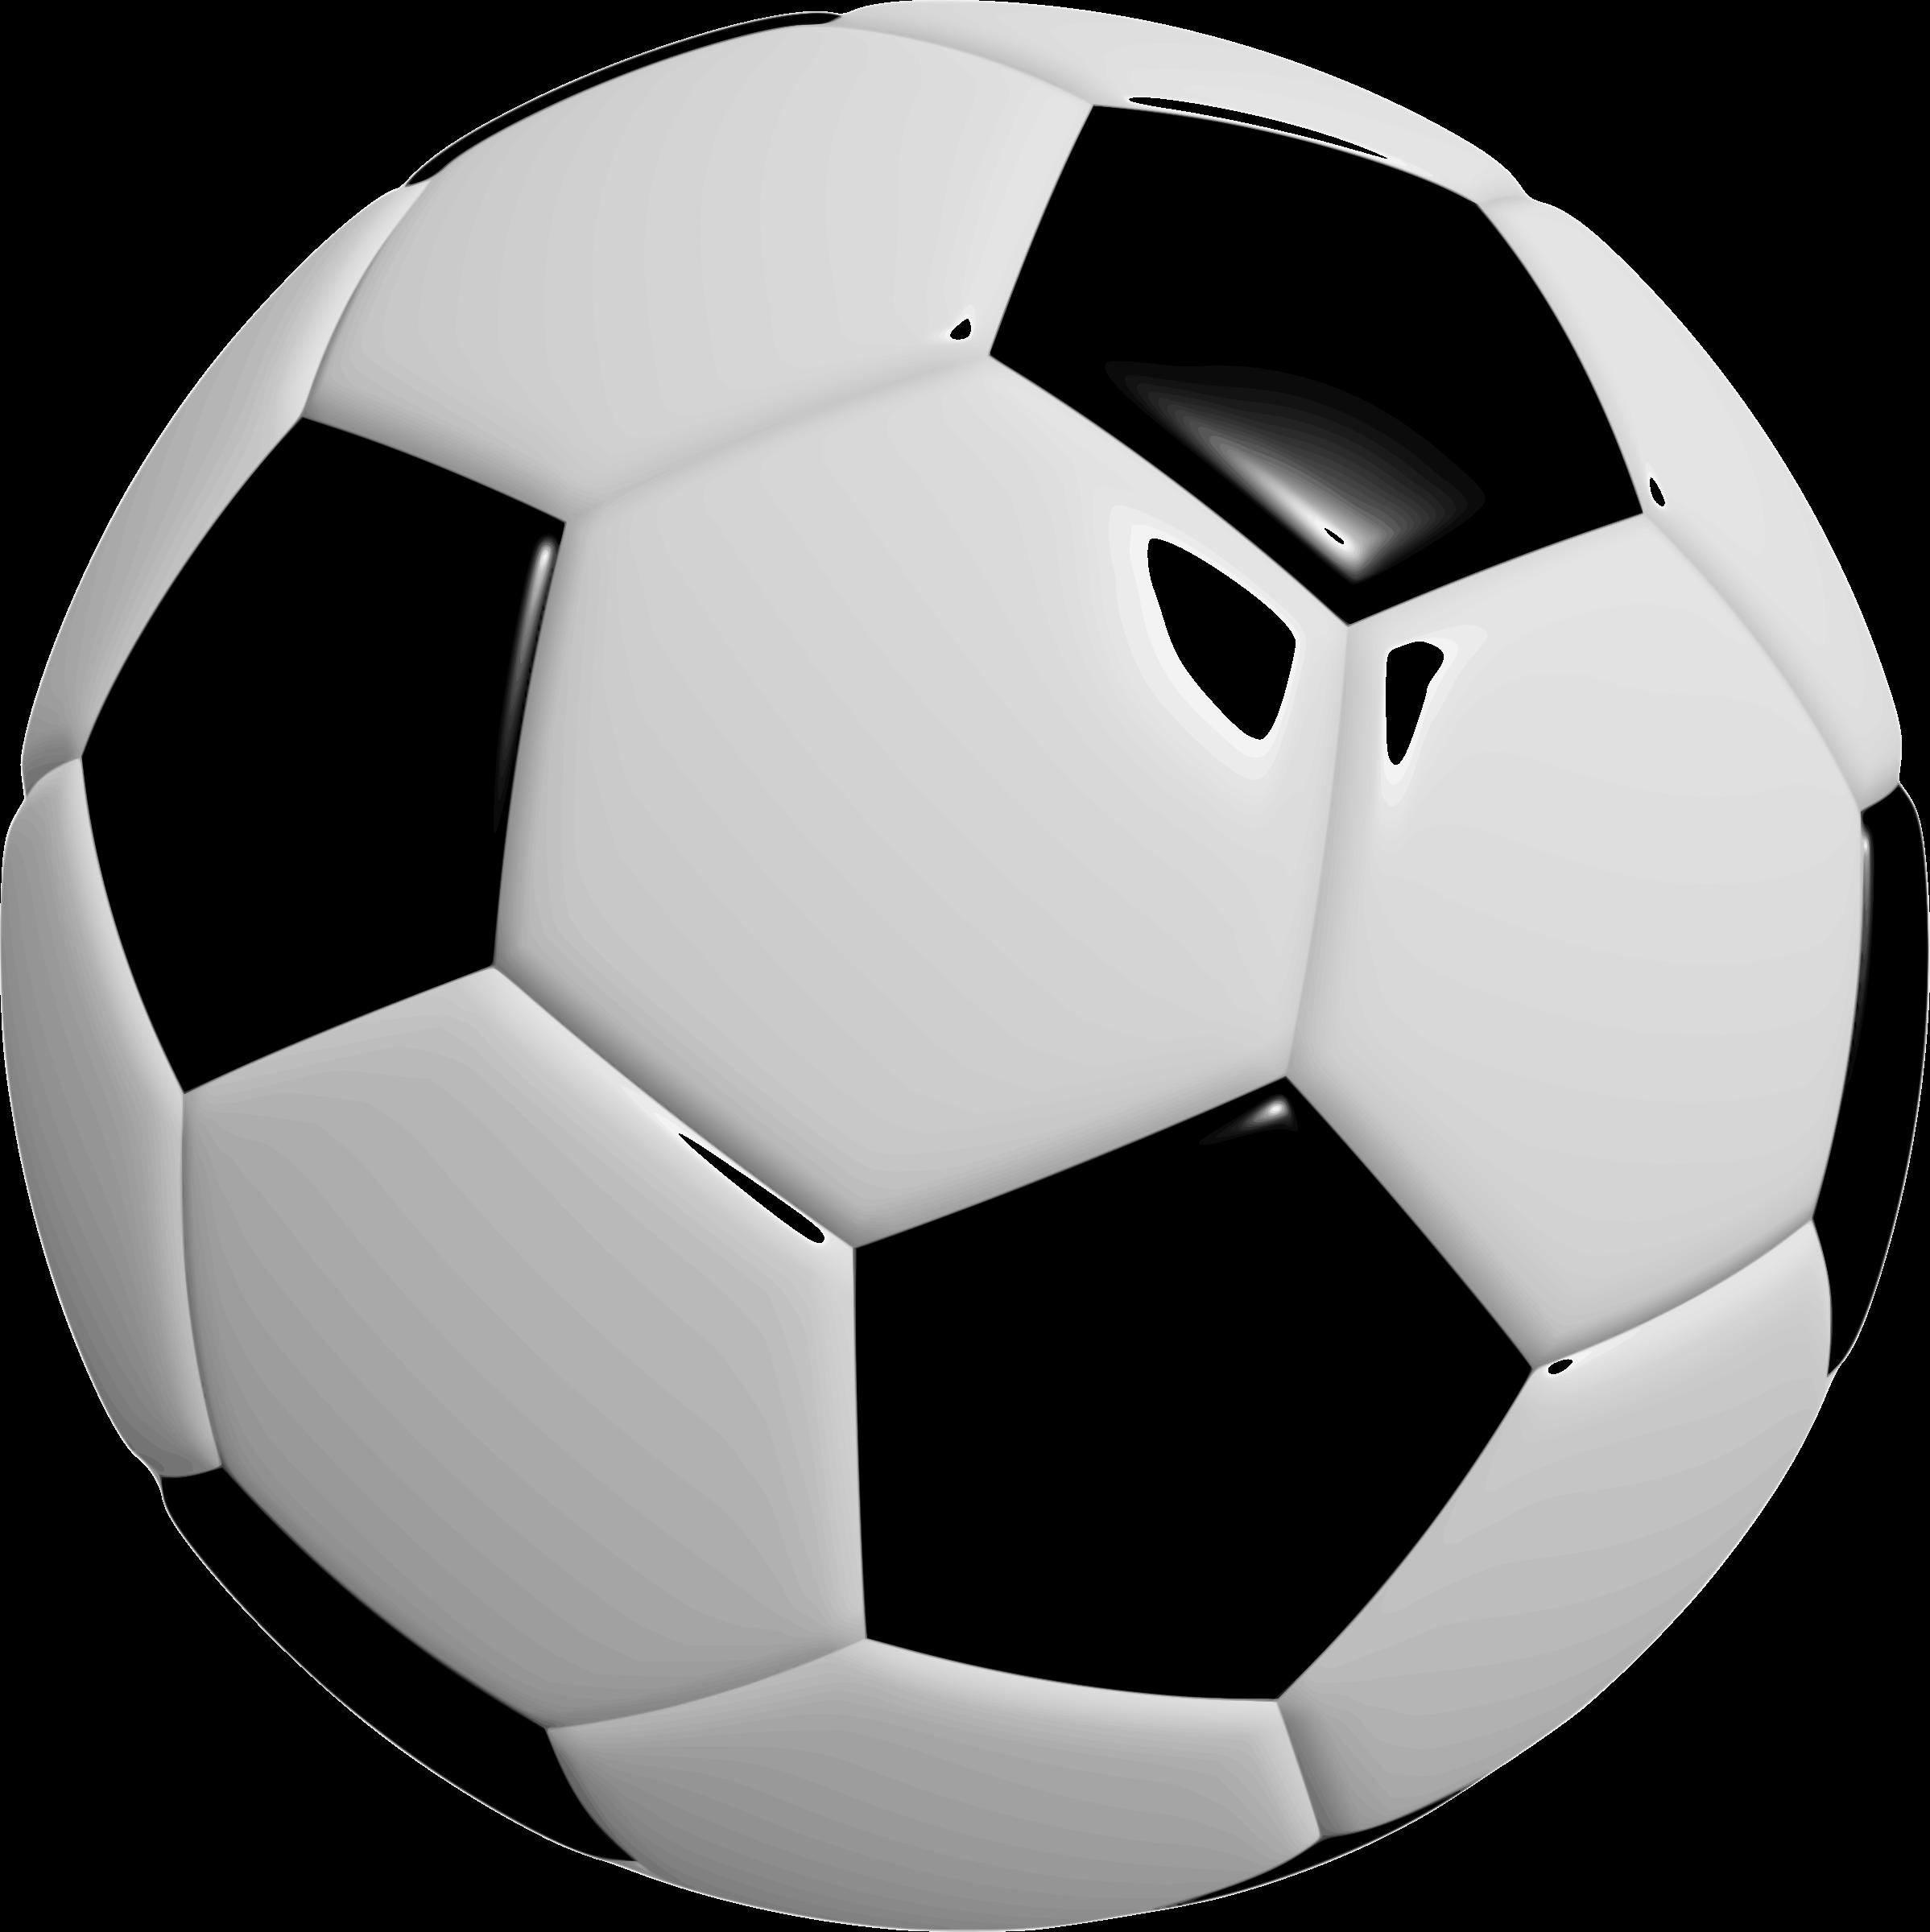 Football ball big image. Foot clipart soccer